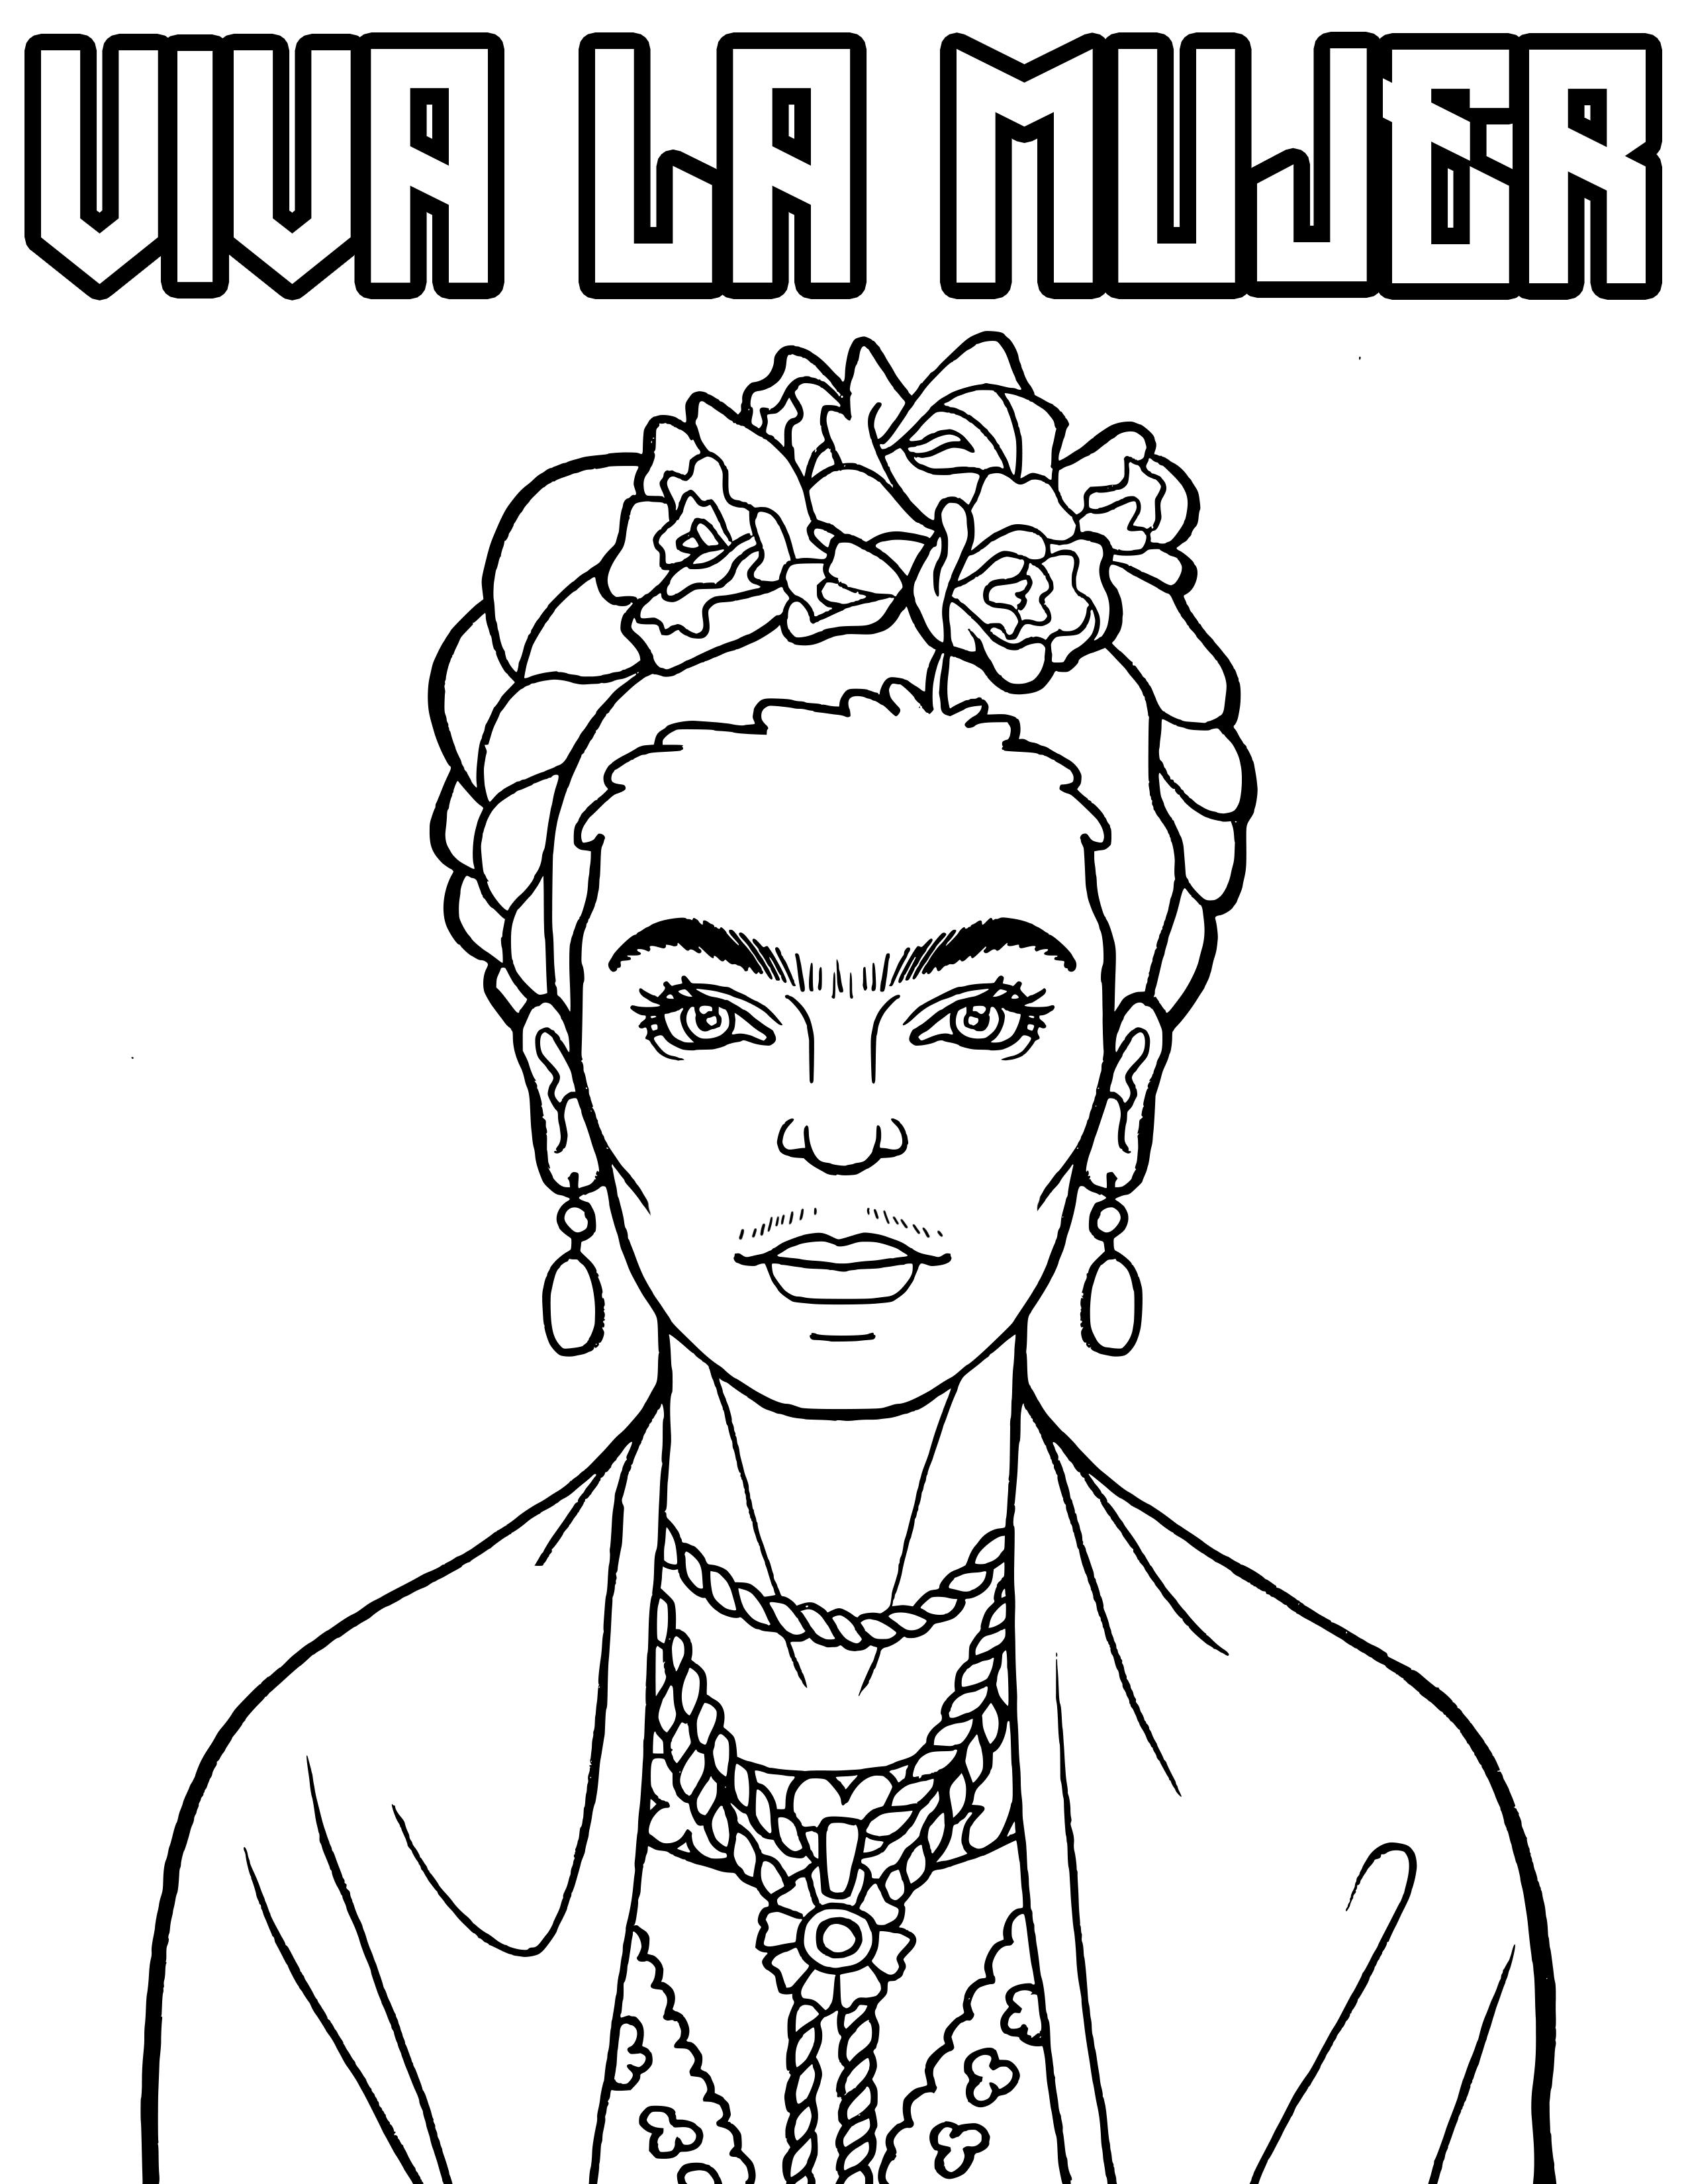 Viva La Mujer Downloadable Coloring Page